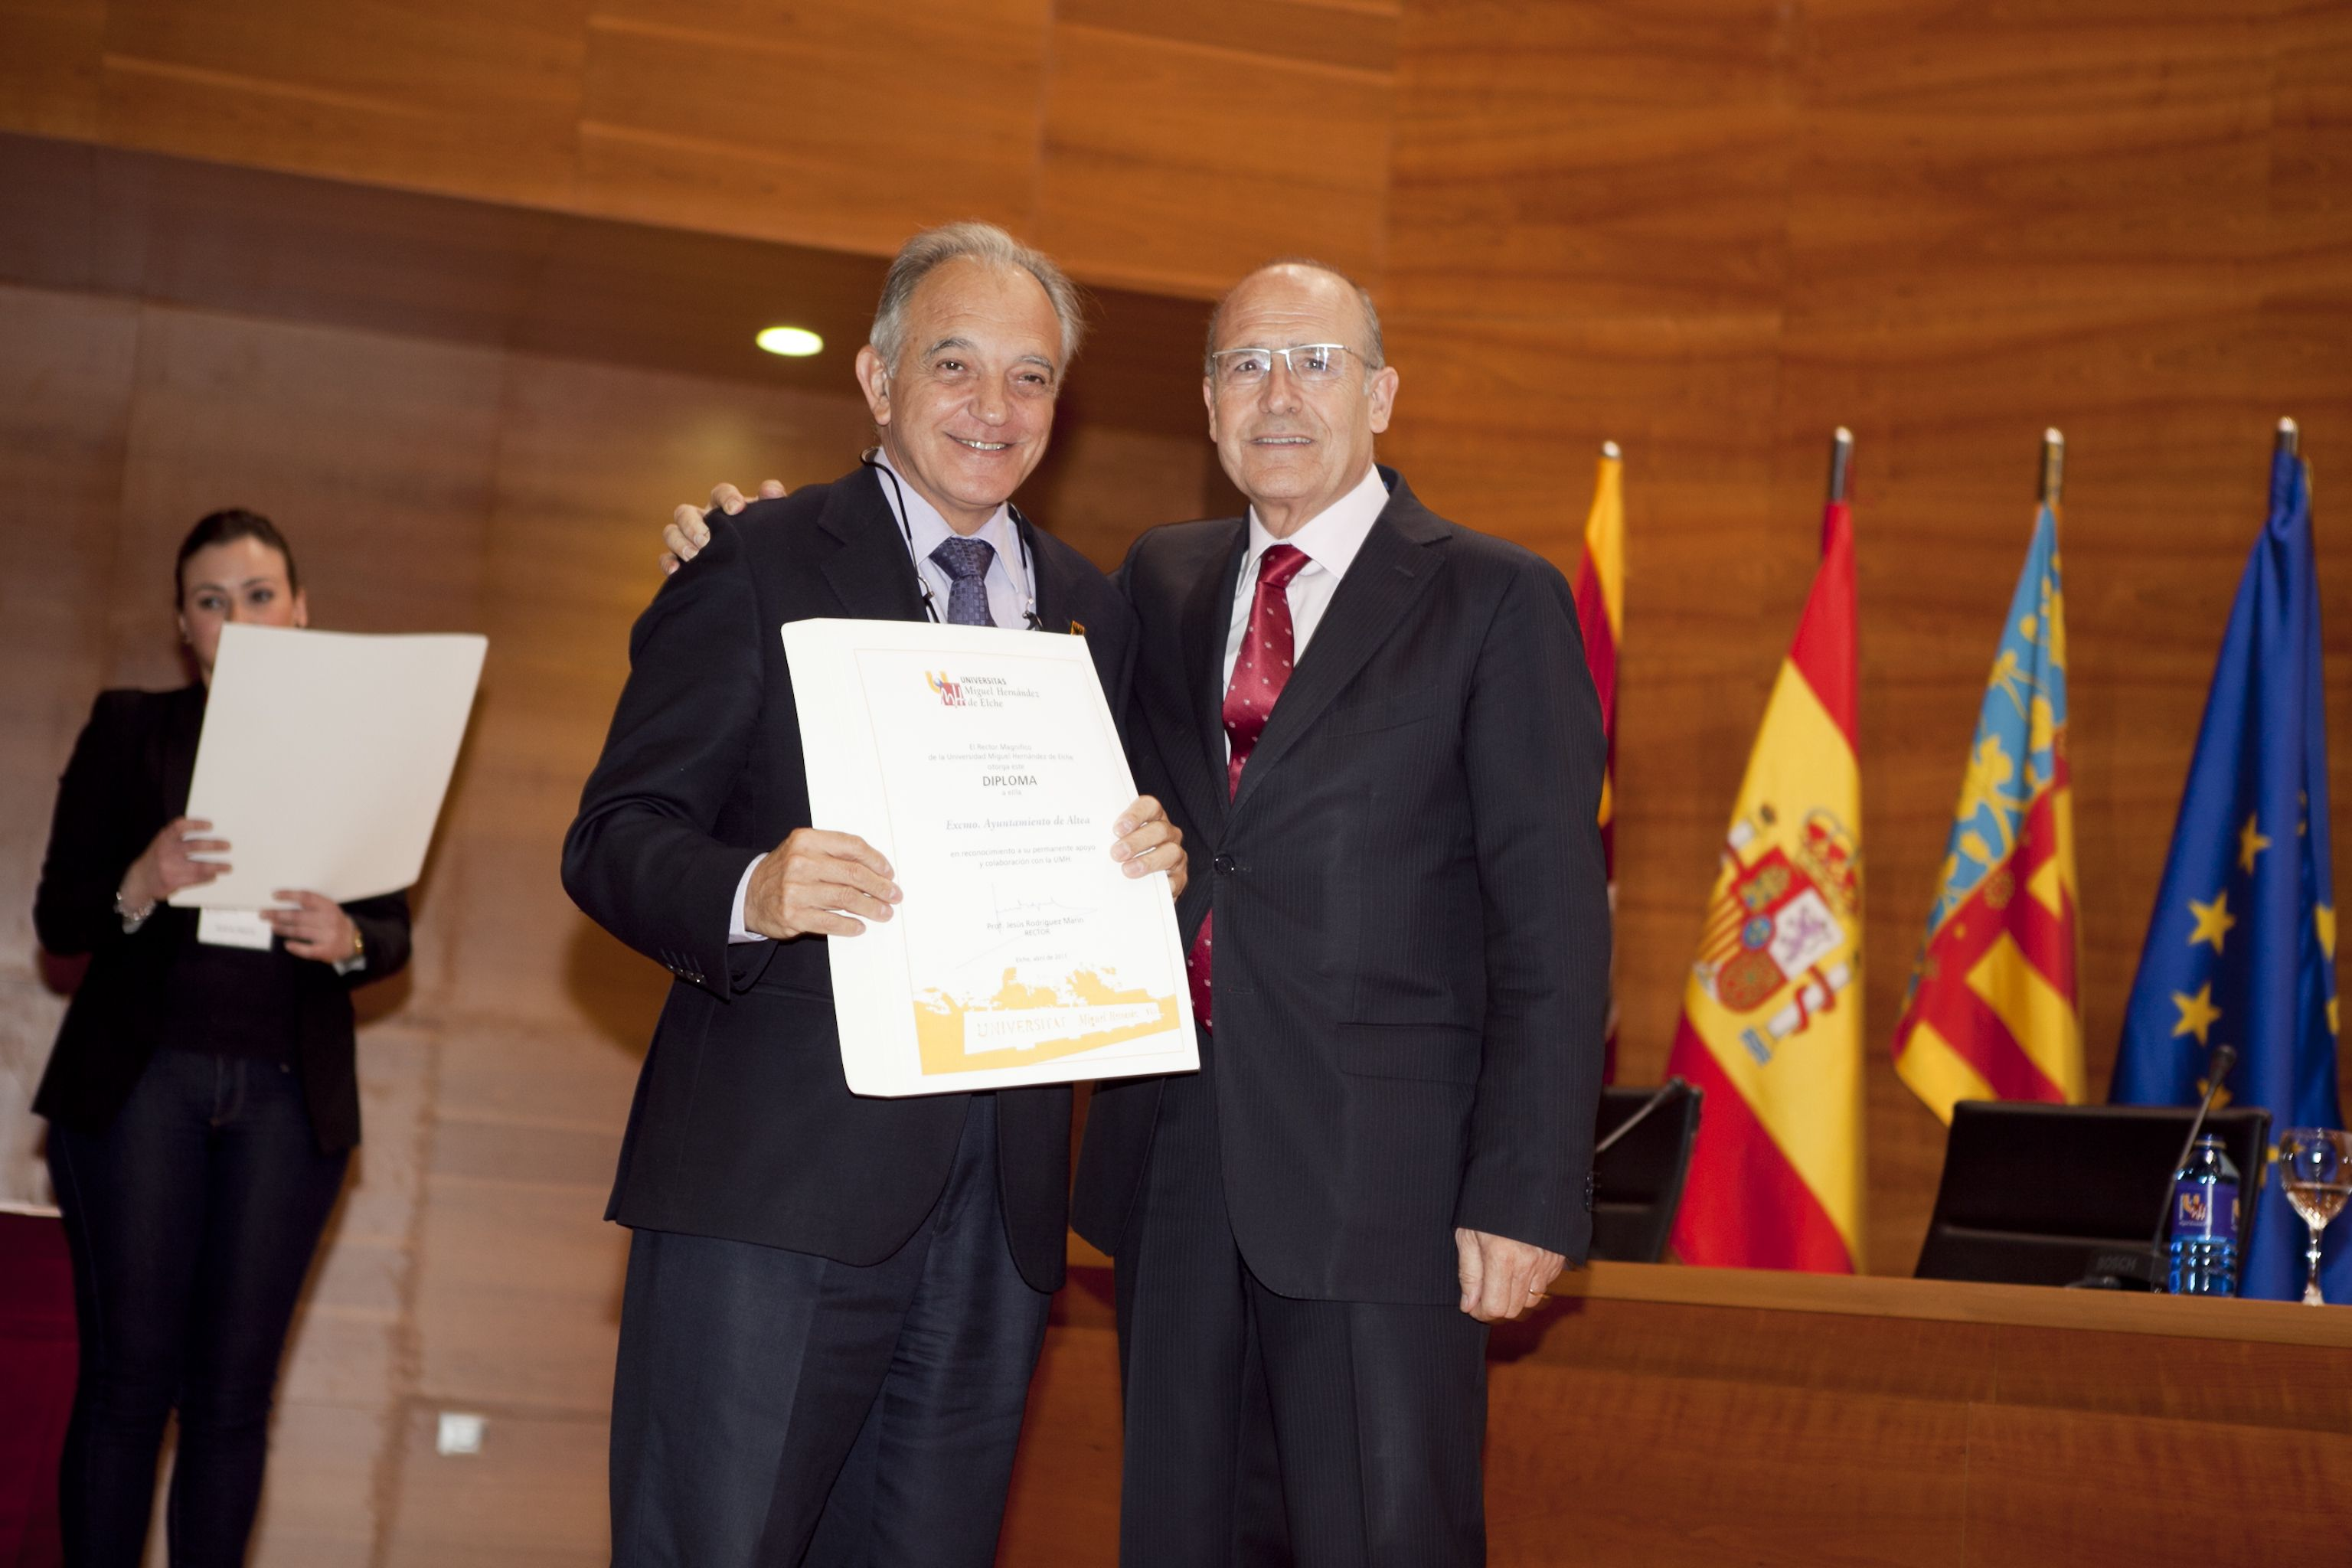 umh-diplomas-rector_mg_7031.jpg